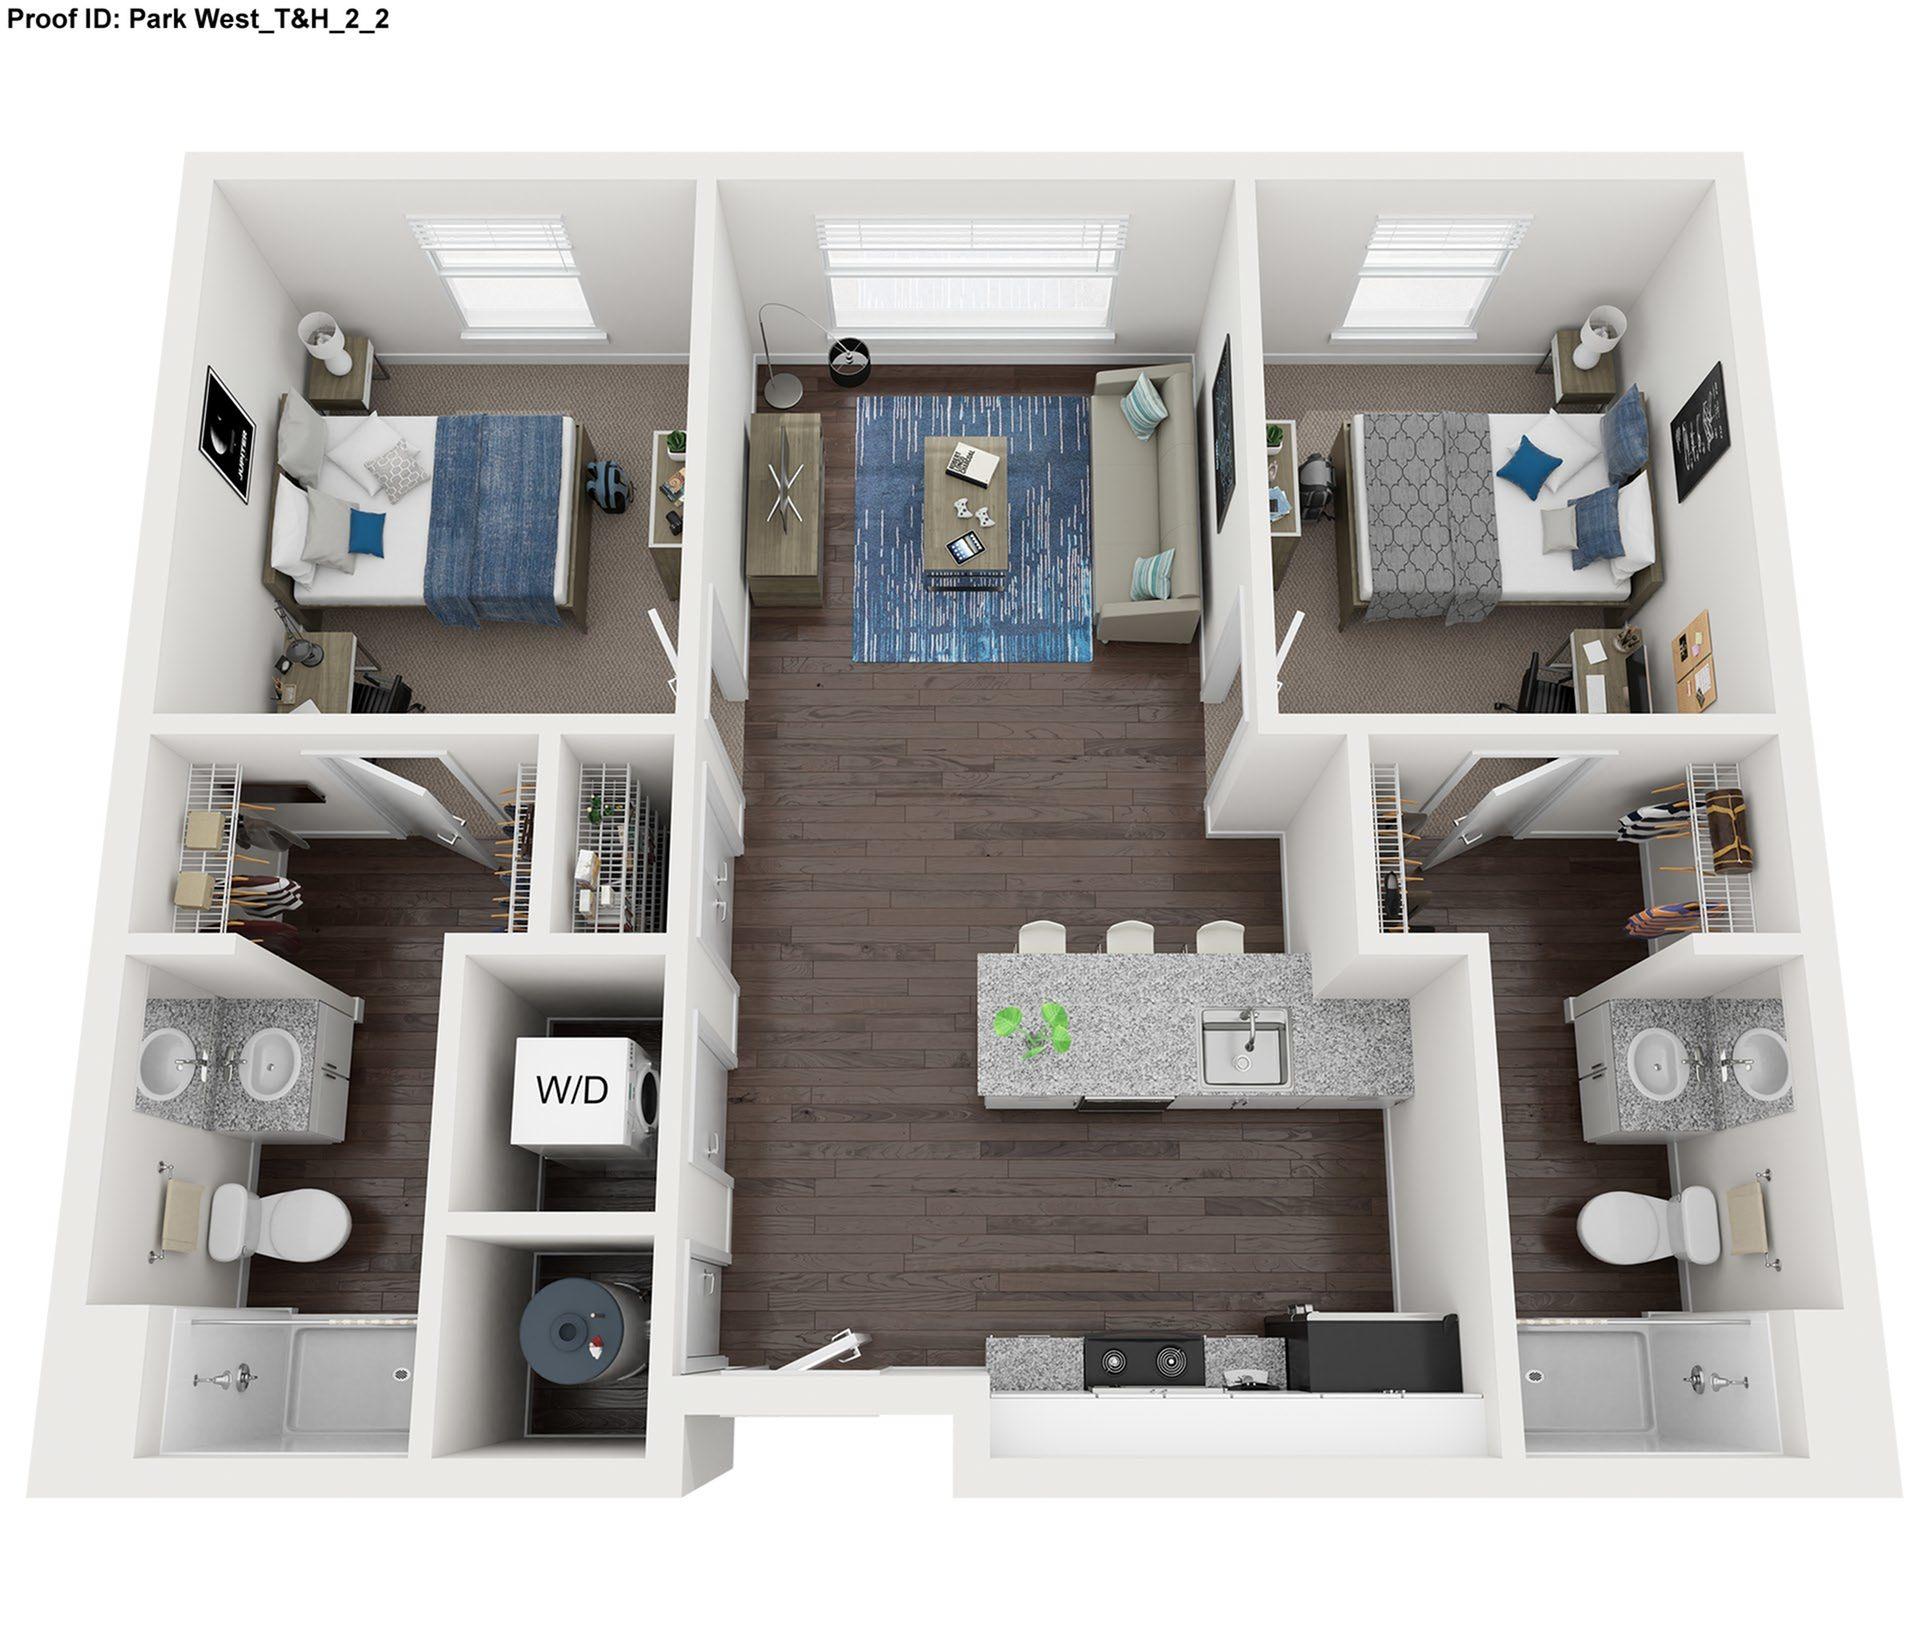 2 Bedroom Floor Plan  |  Park West  | Apartments In College Station, Texas